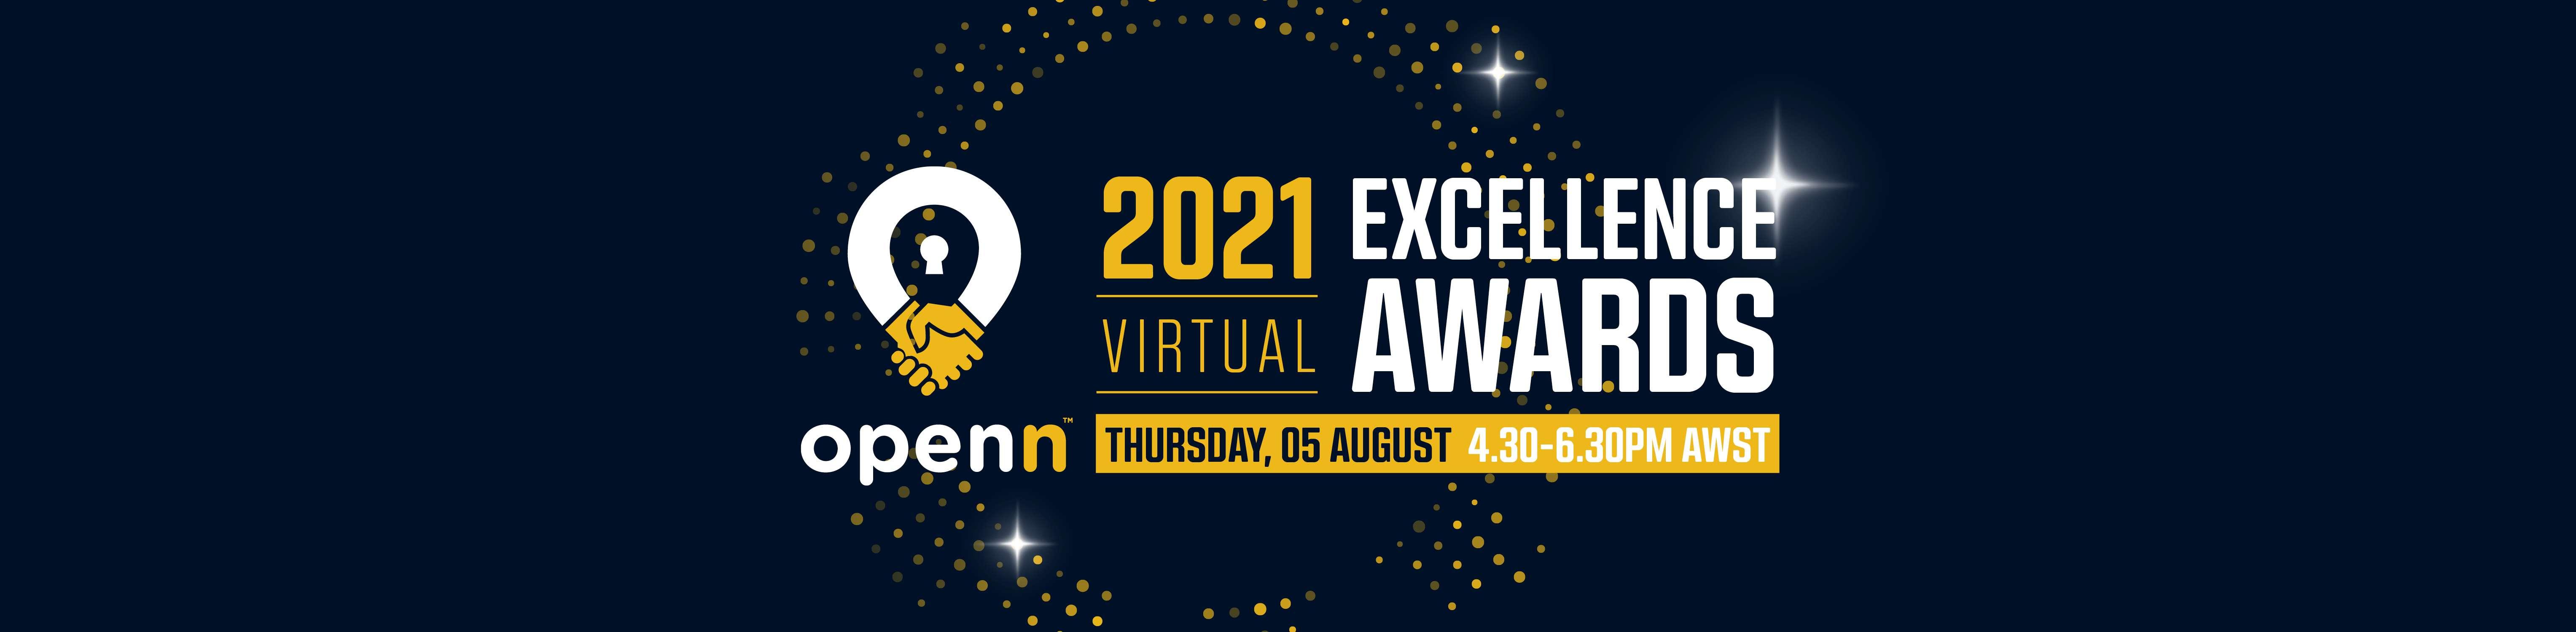 Openn Excellence Awards 2021